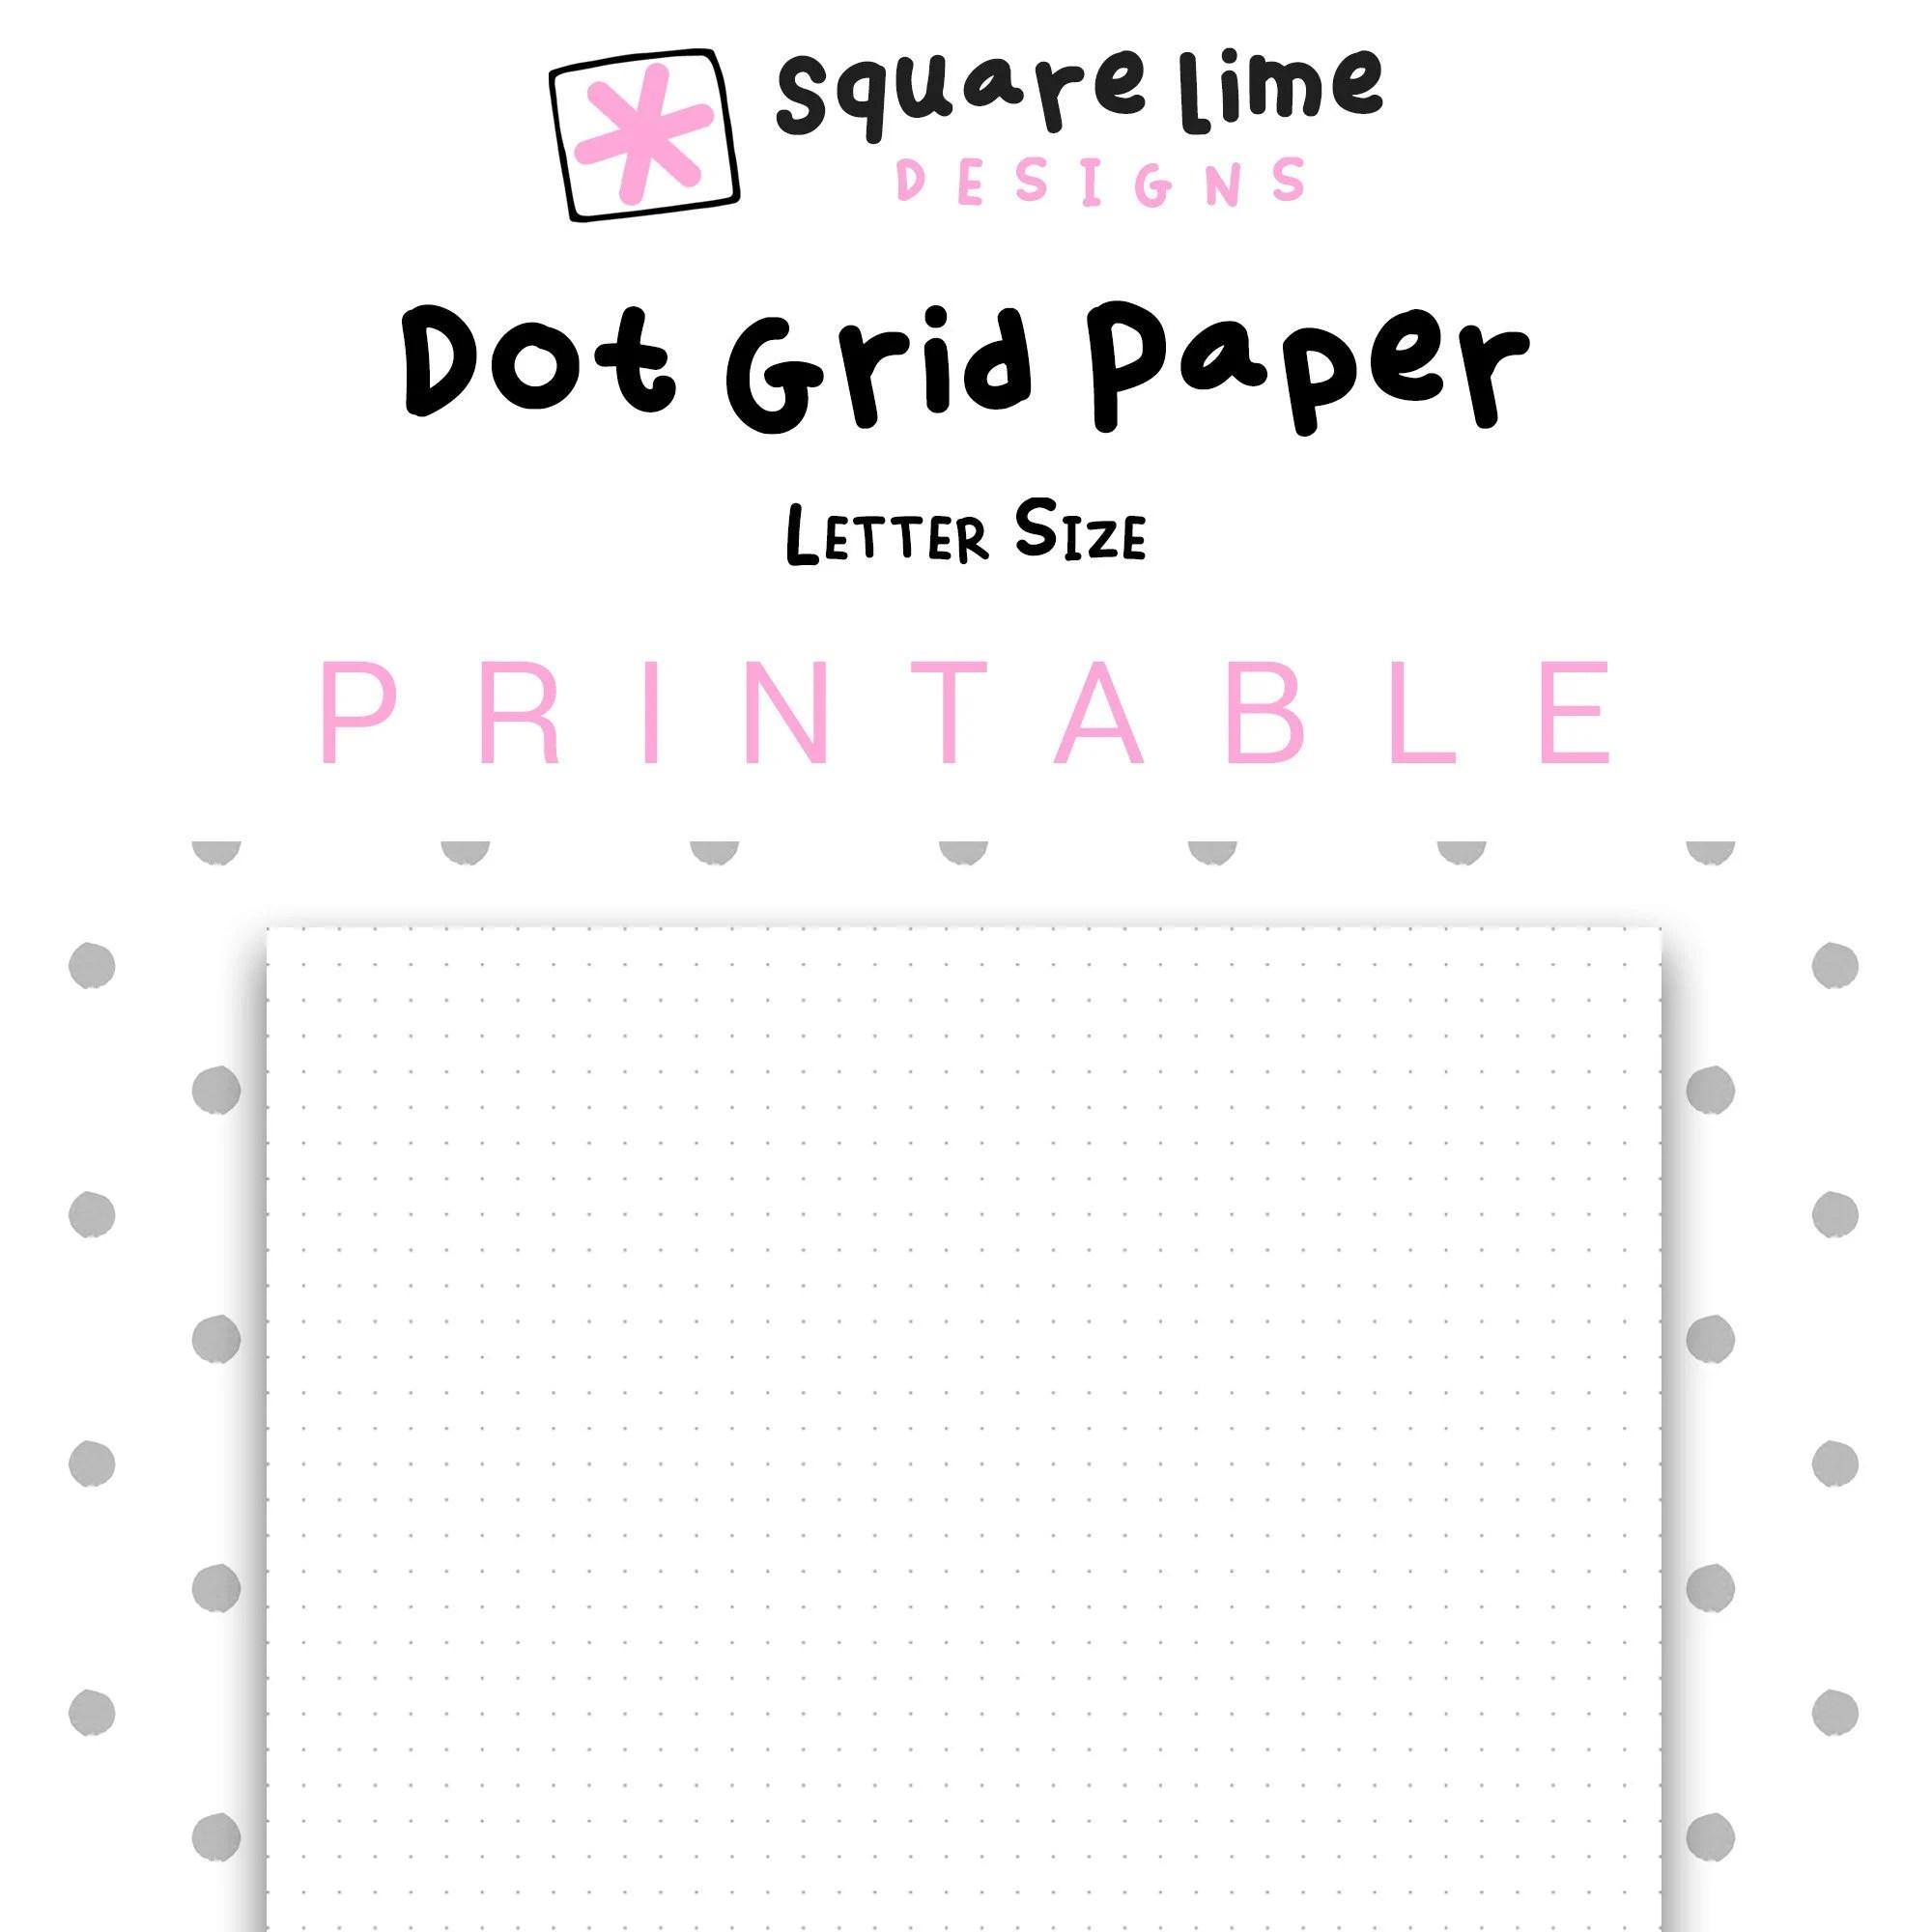 Printable Dot Grid Paper Letter Size Dotted Paper Bullet